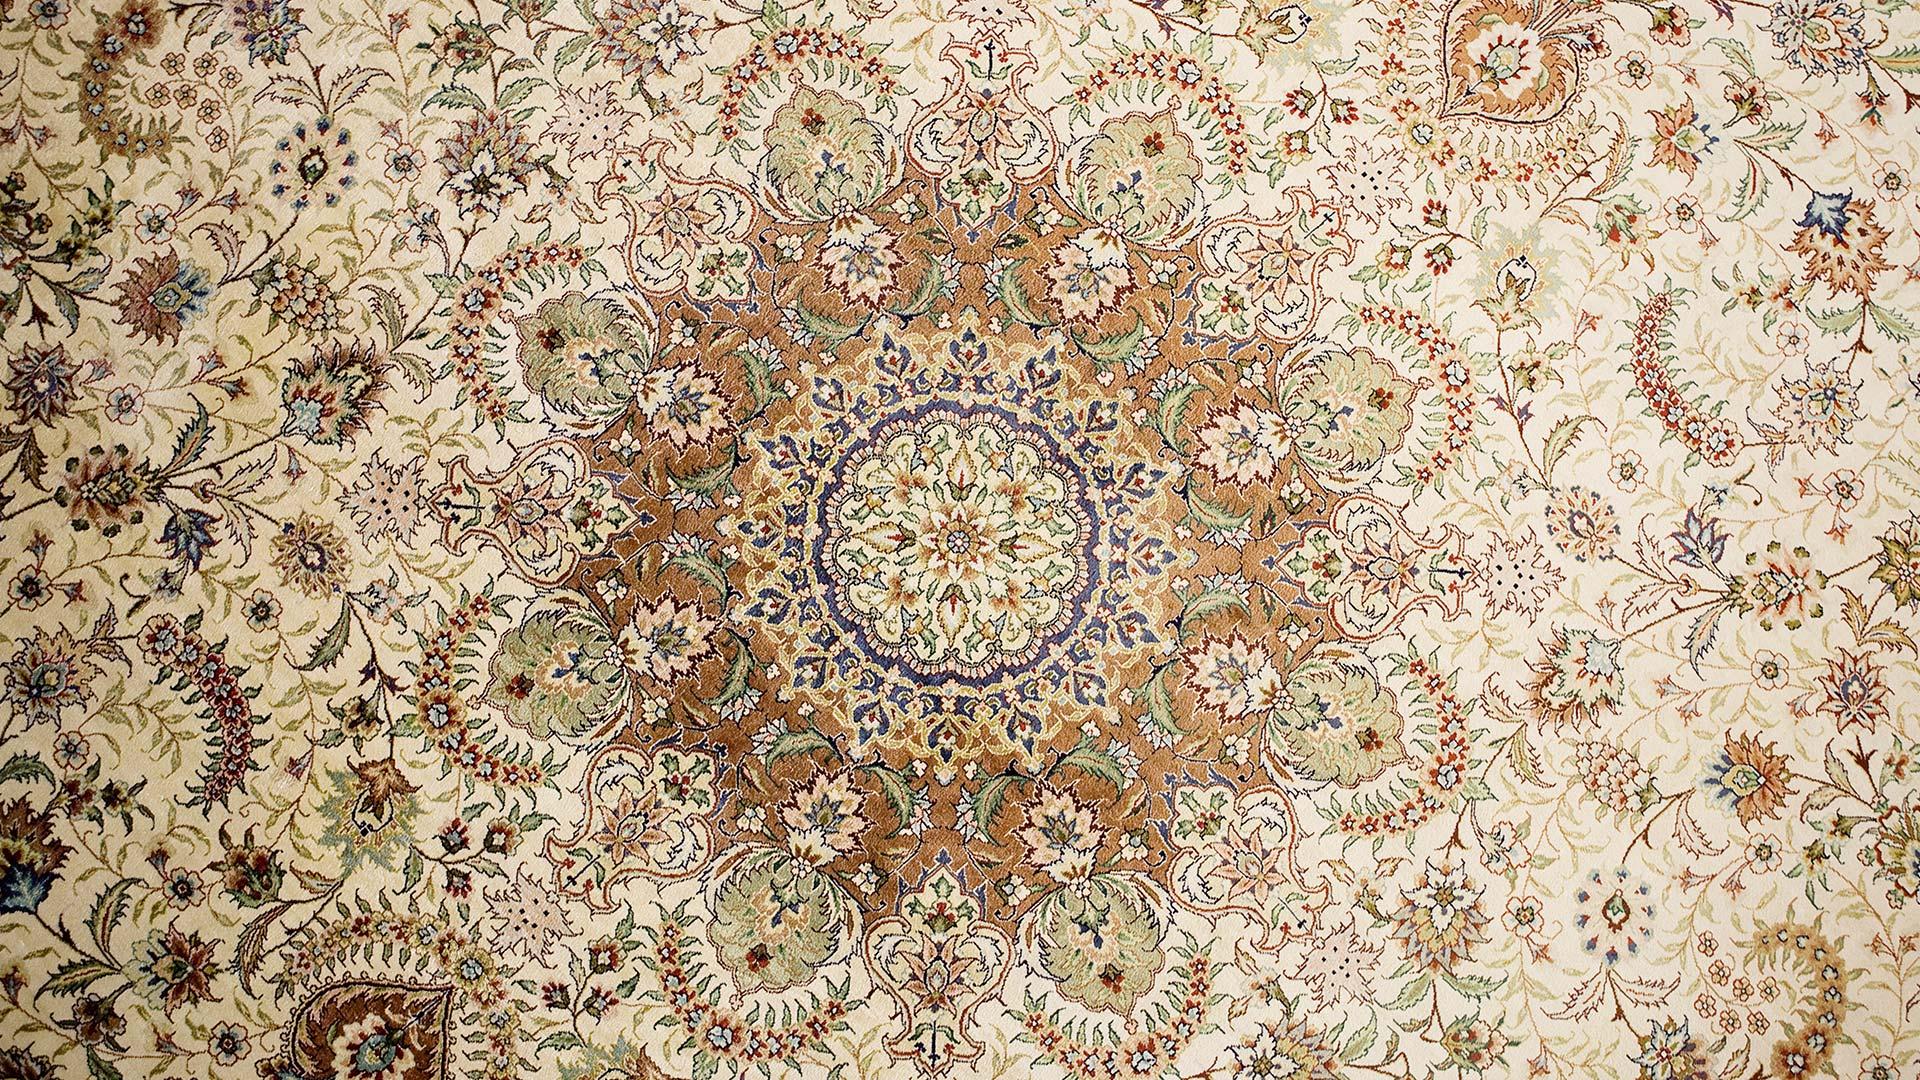 Iranian Wallpapers Wallpaper Cave